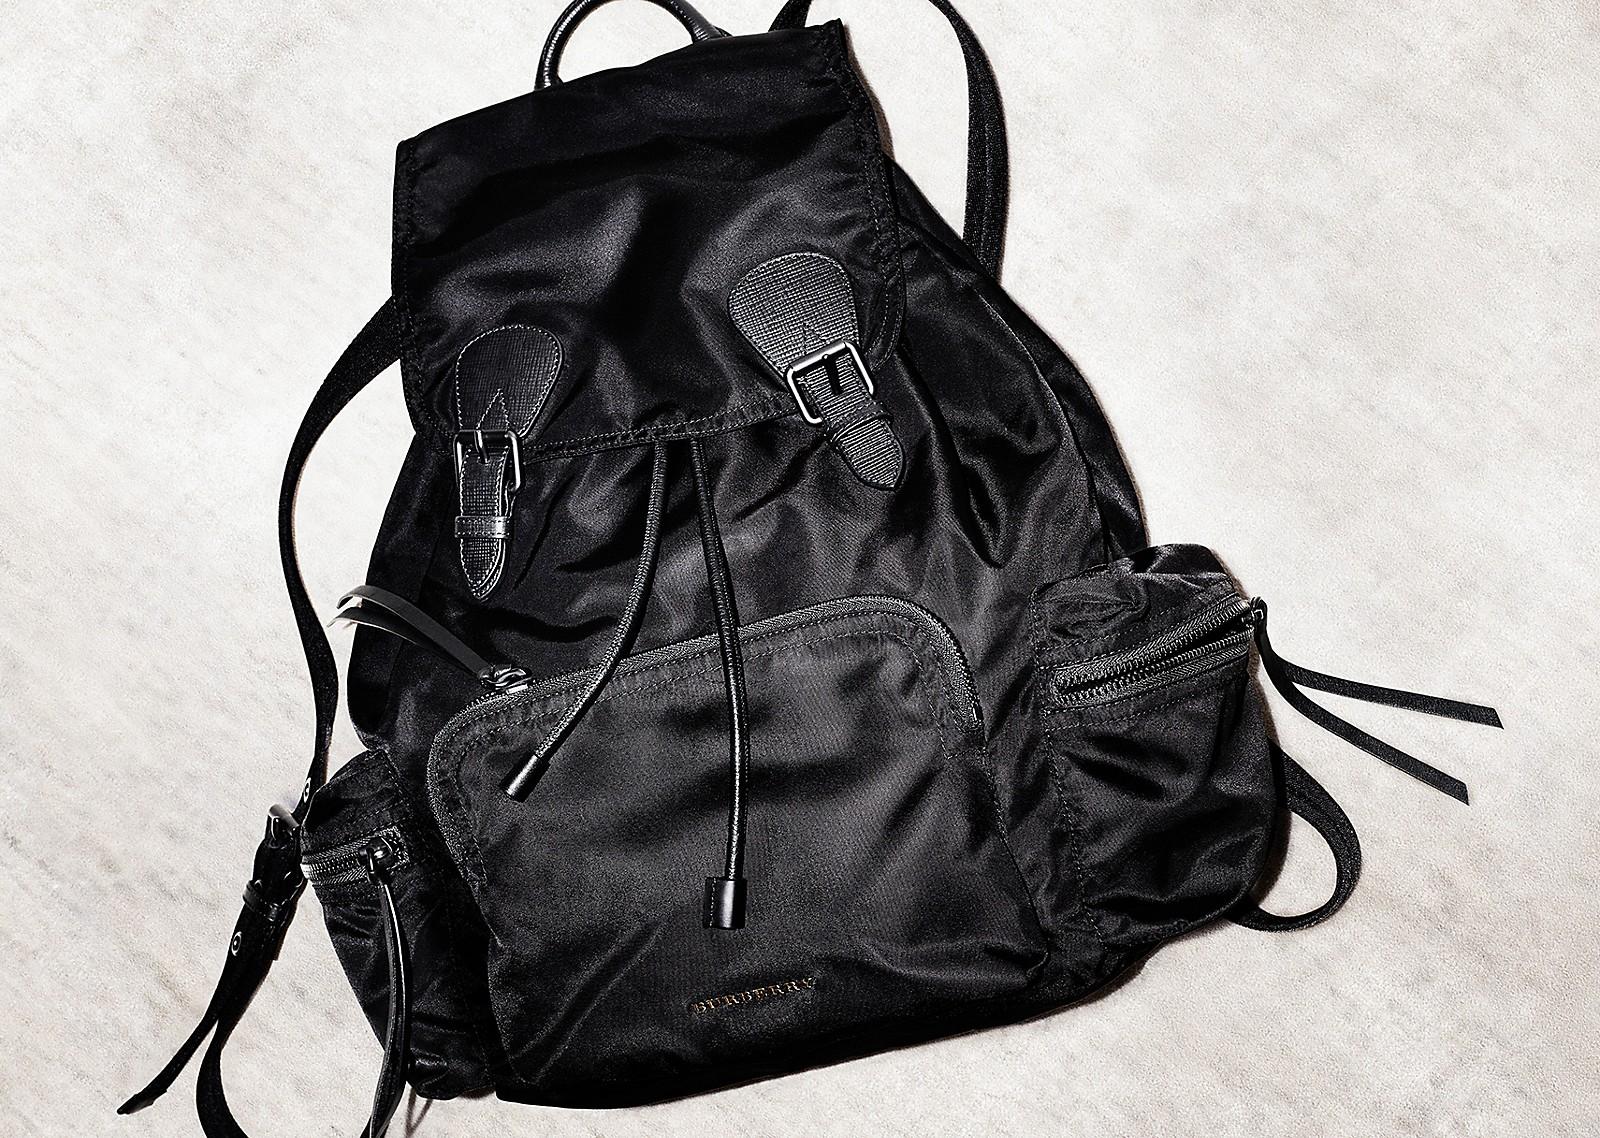 La mochila Rucksack